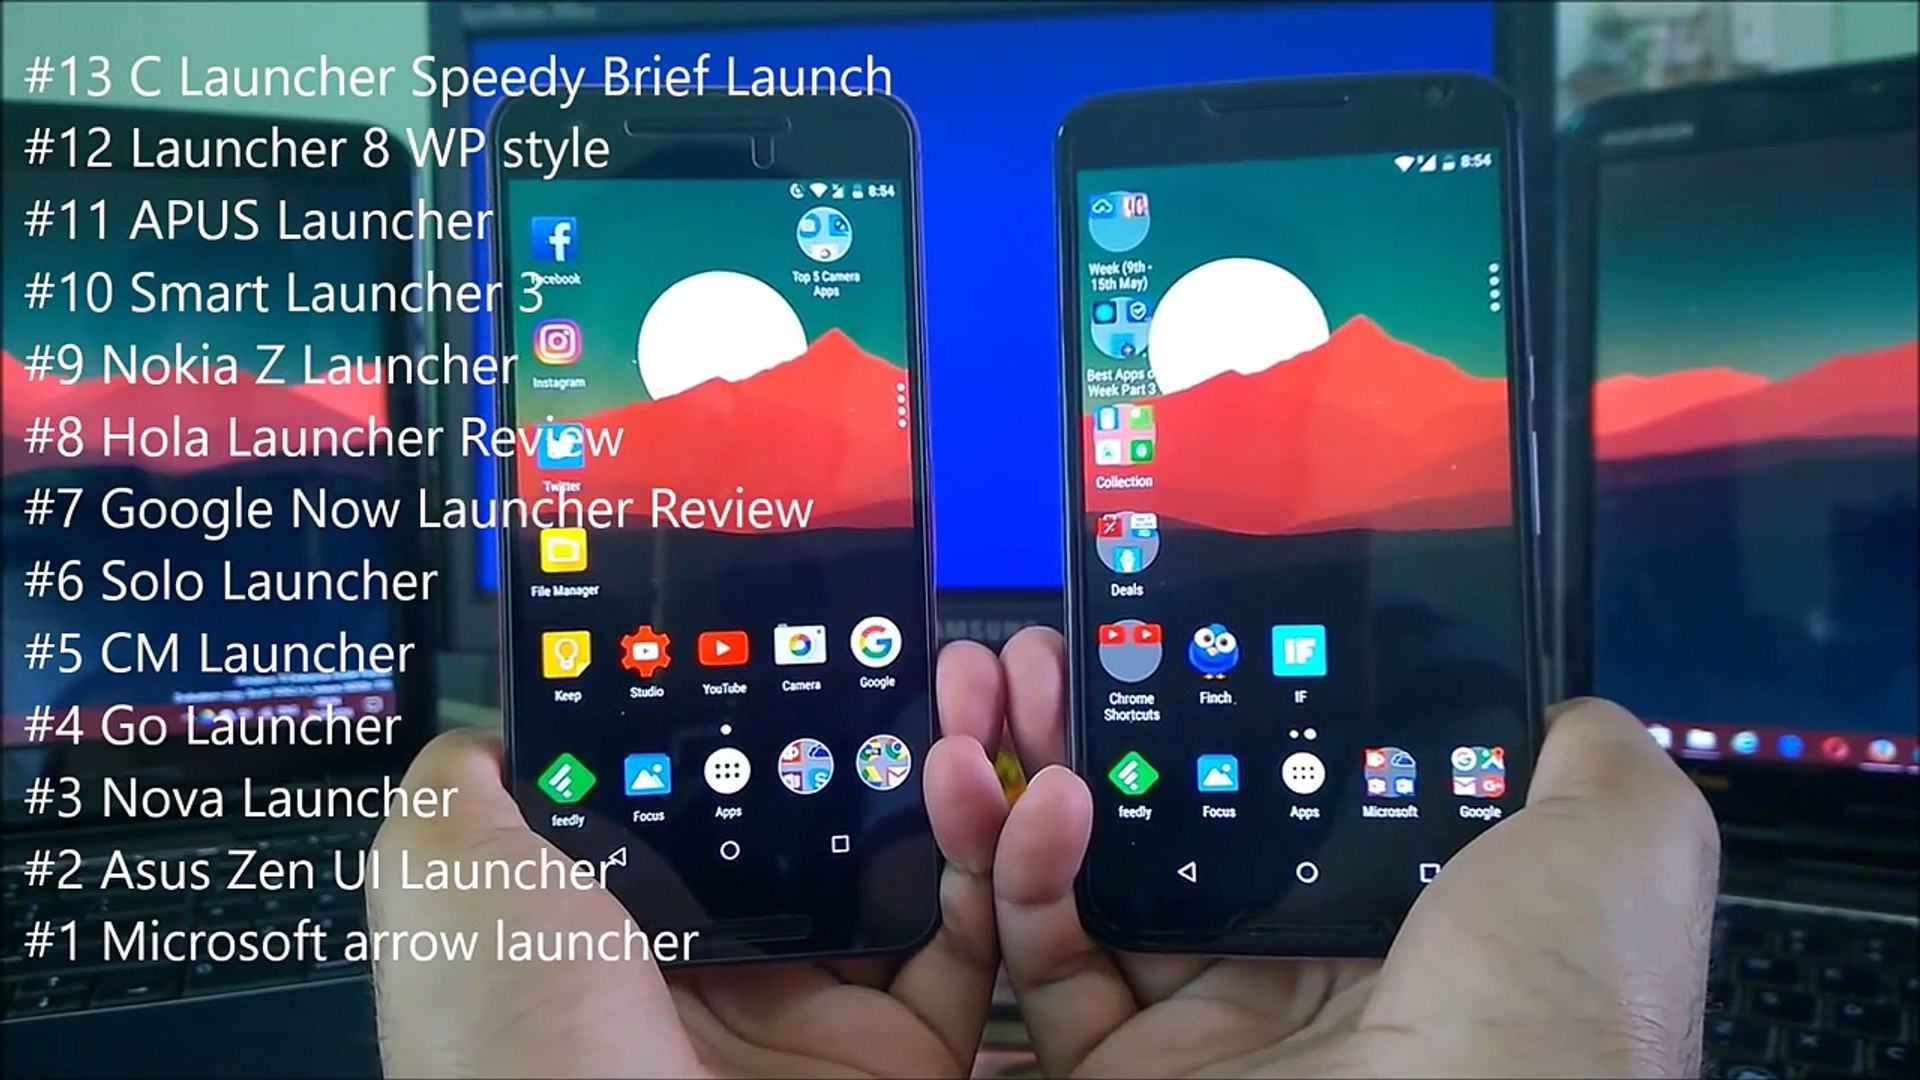 Best Android Launcher Ever 2016 - Nova Launcher Prime Review